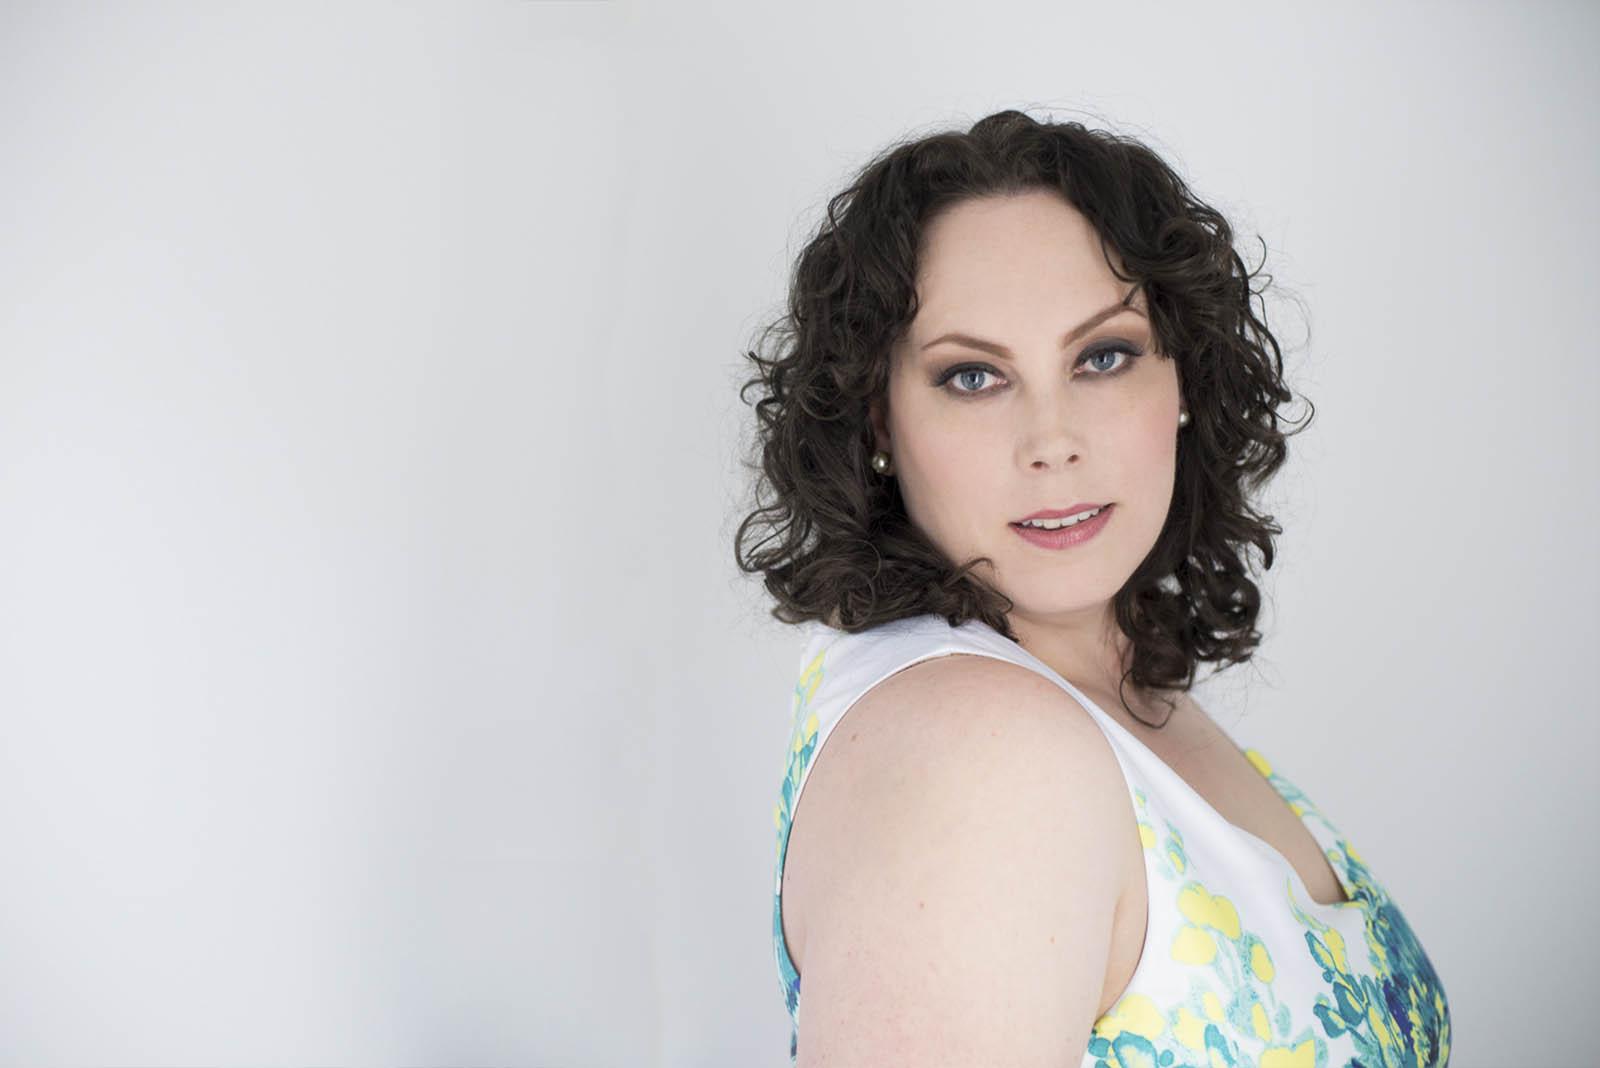 Chelsey Luren Portraits - Eating Disorder Recovery Photoshoot   Nicole Testimonial9.jpg